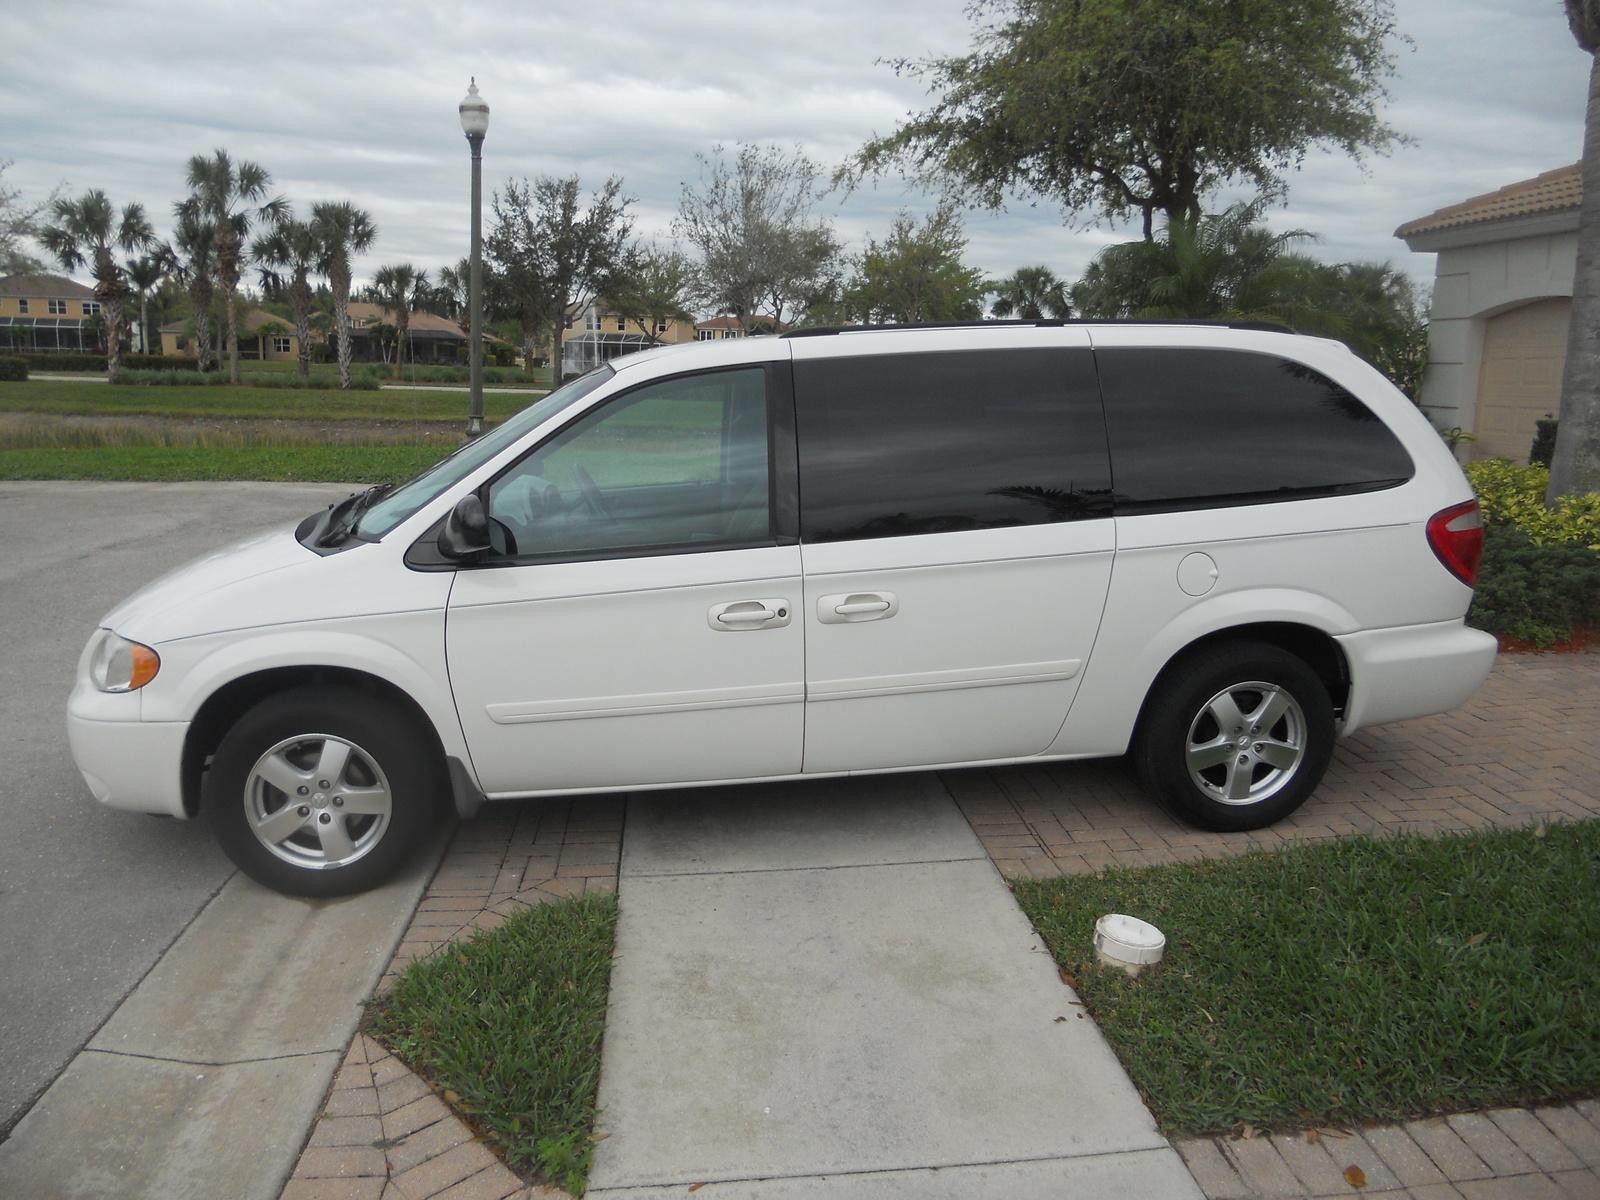 Dodge Grand Caravan Questions - Where is my car listing? - CarGurus